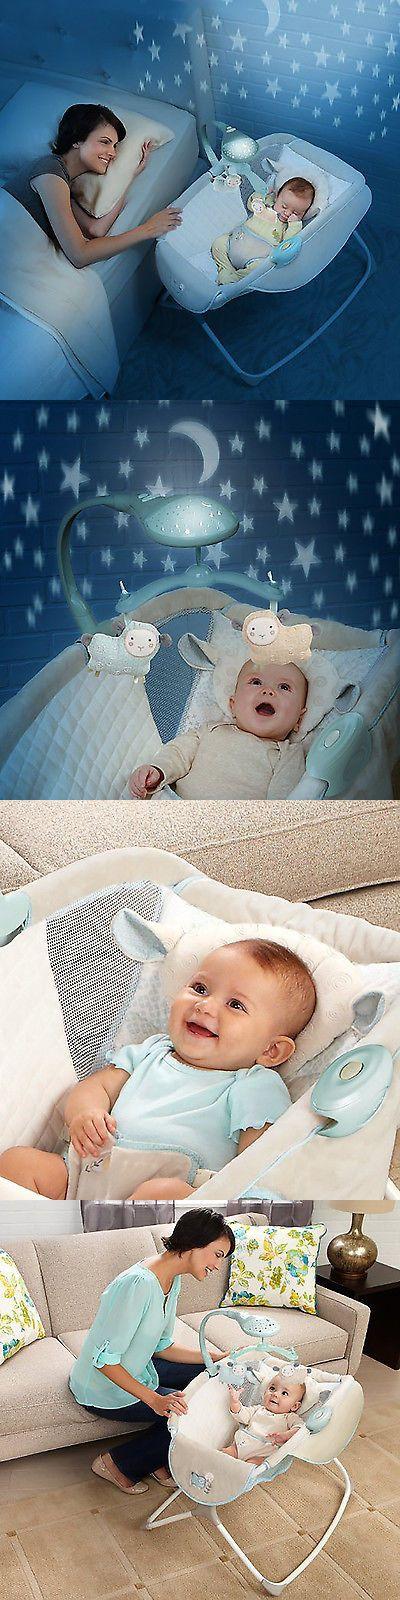 Baby Nursery: Moonlight Rocking Baby Sleeper Bassinet Cradle Newborn Crib Bed BUY IT NOW ONLY: $64.79